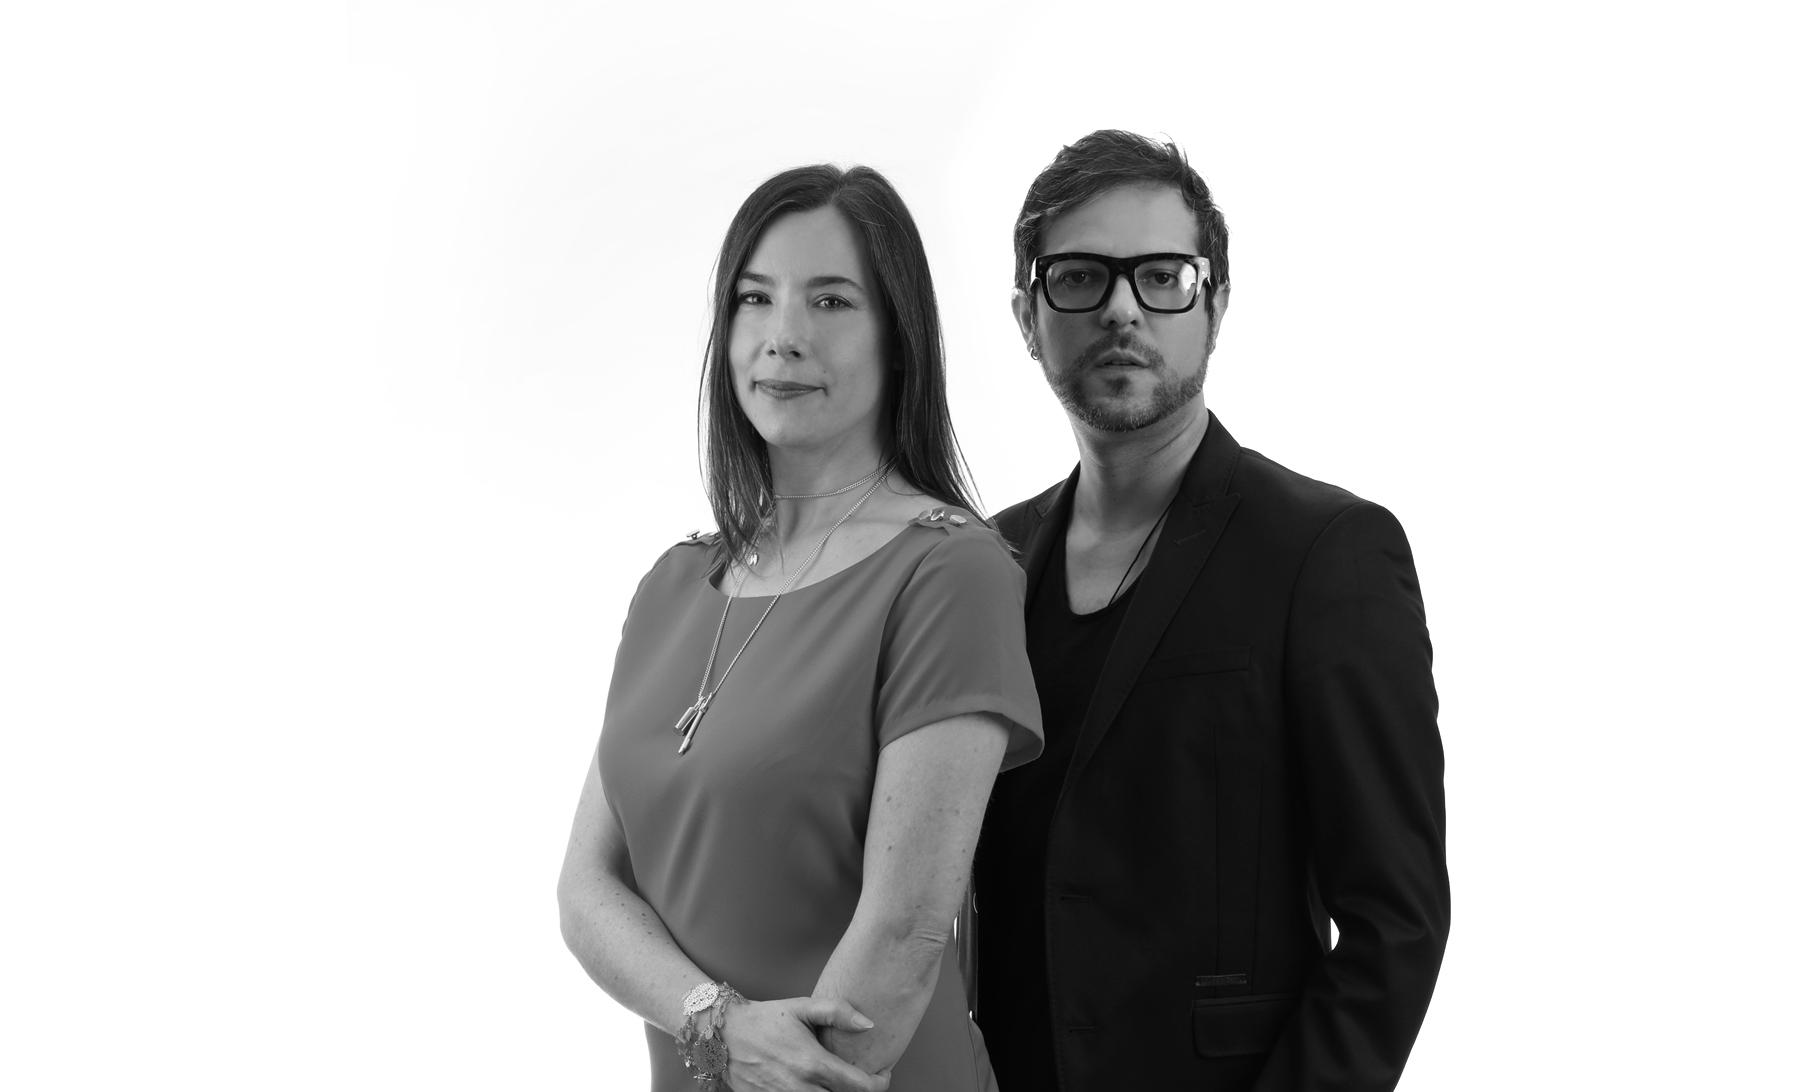 karin dax, agustin salas, designers